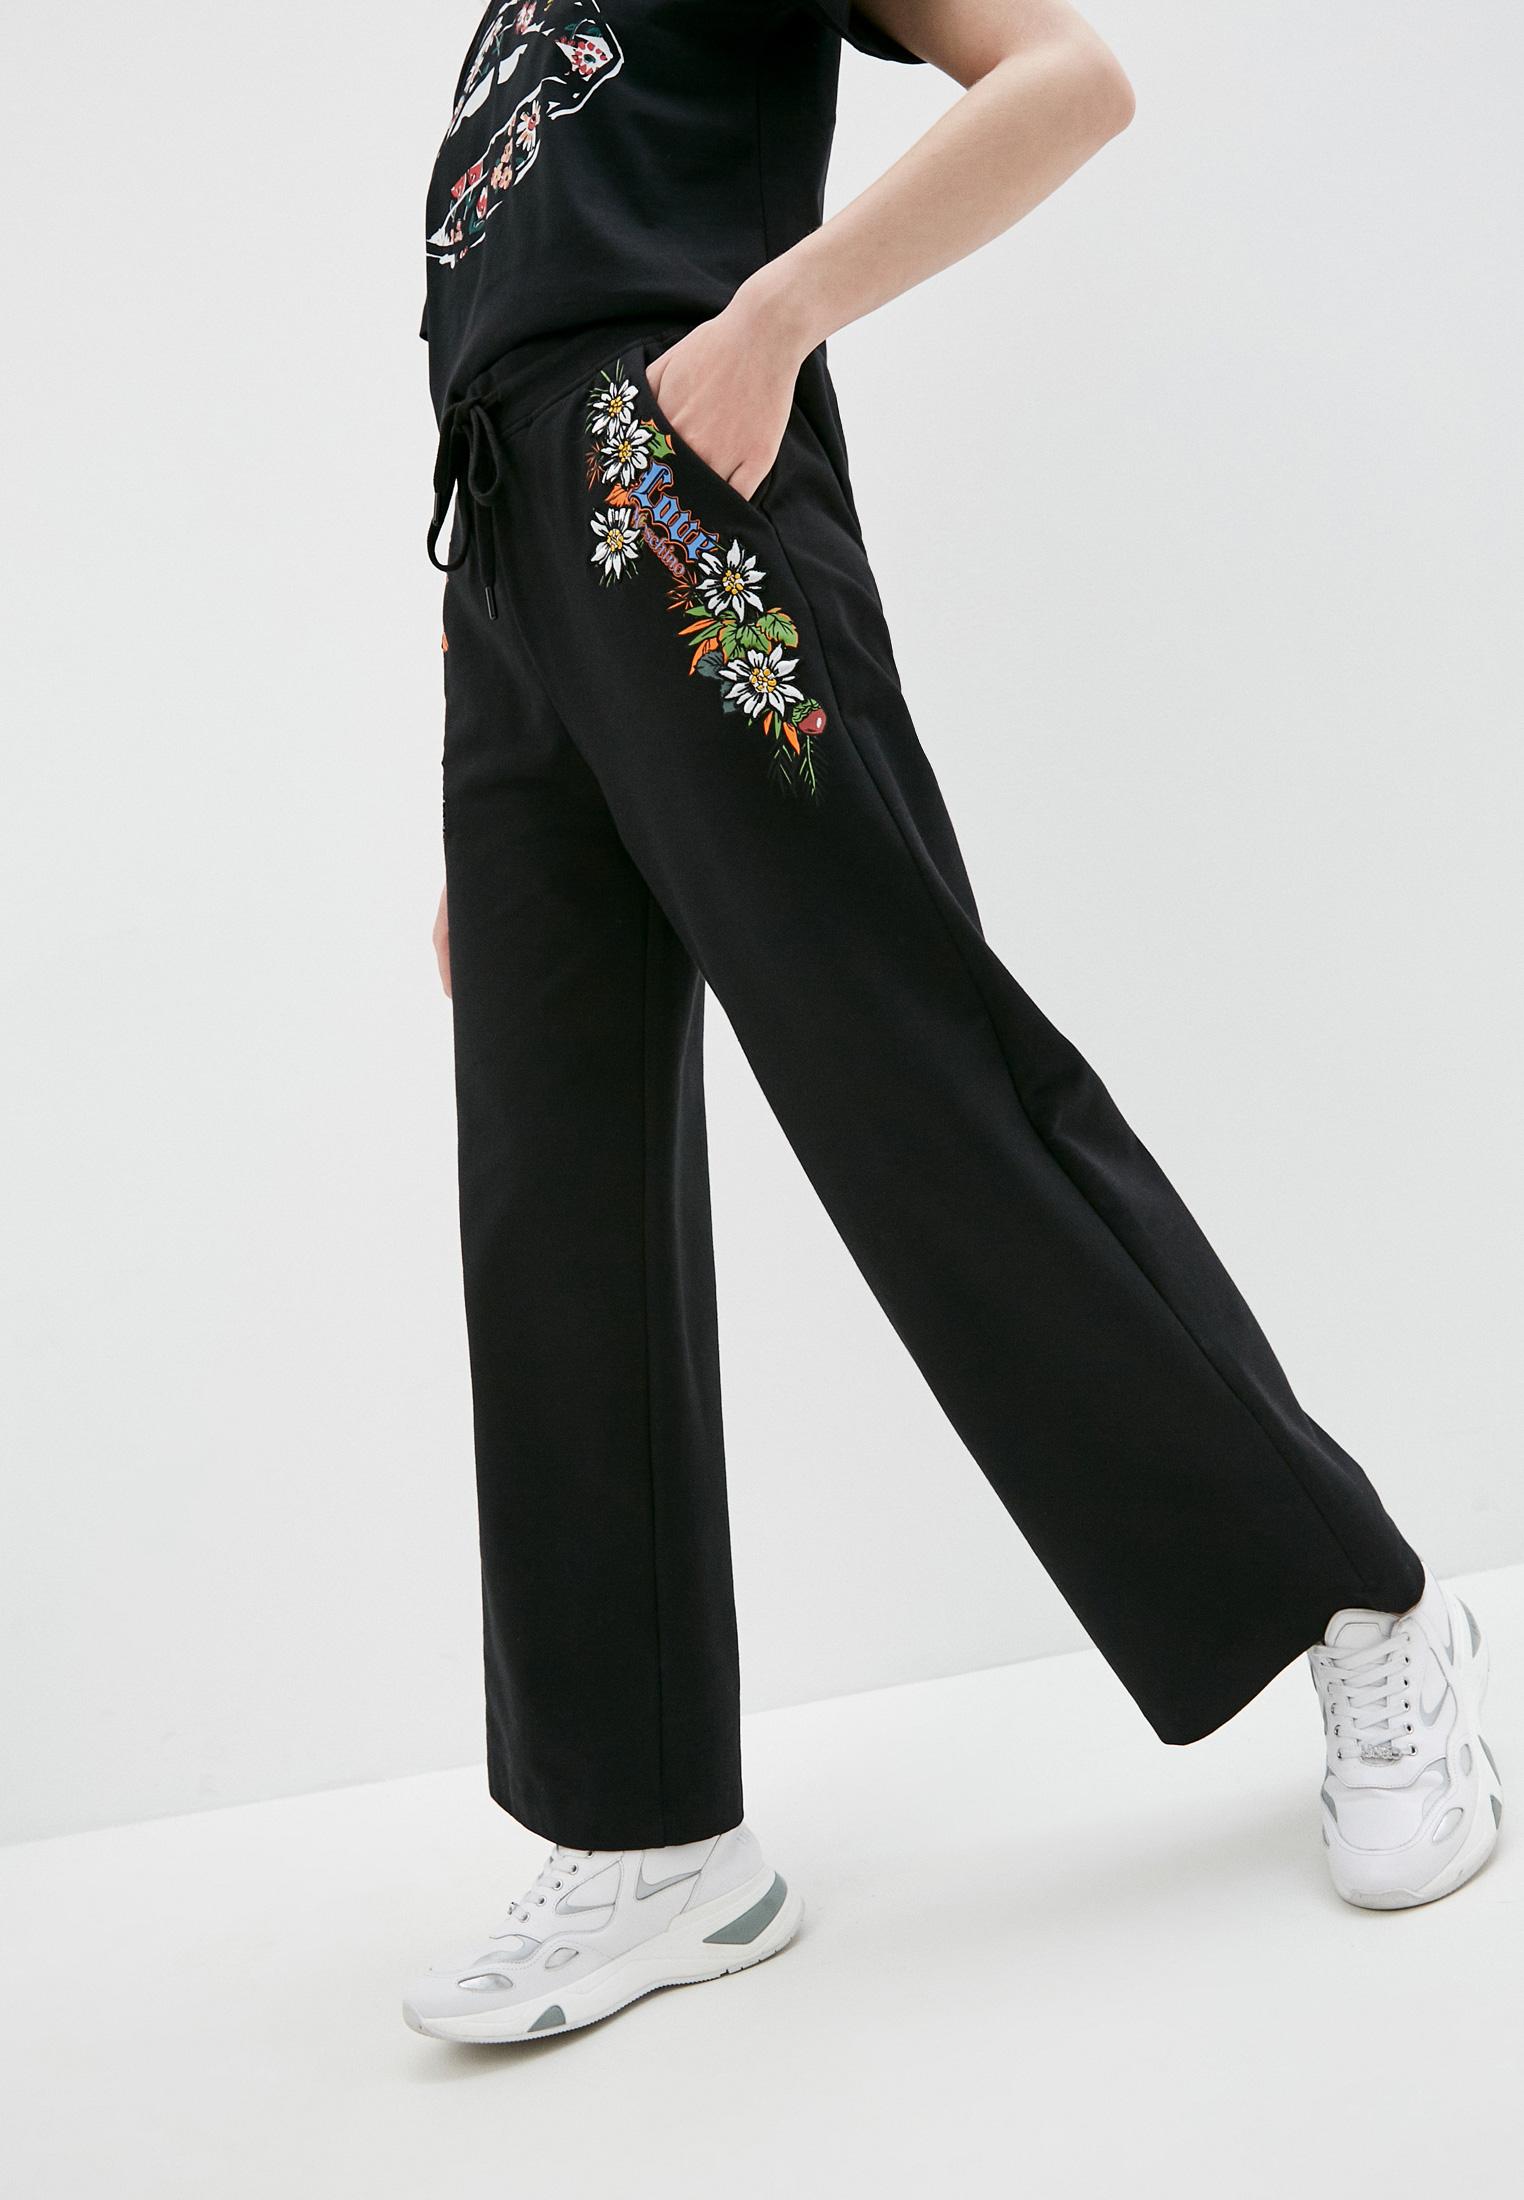 Женские спортивные брюки Love Moschino W 1 487 01 E 1958